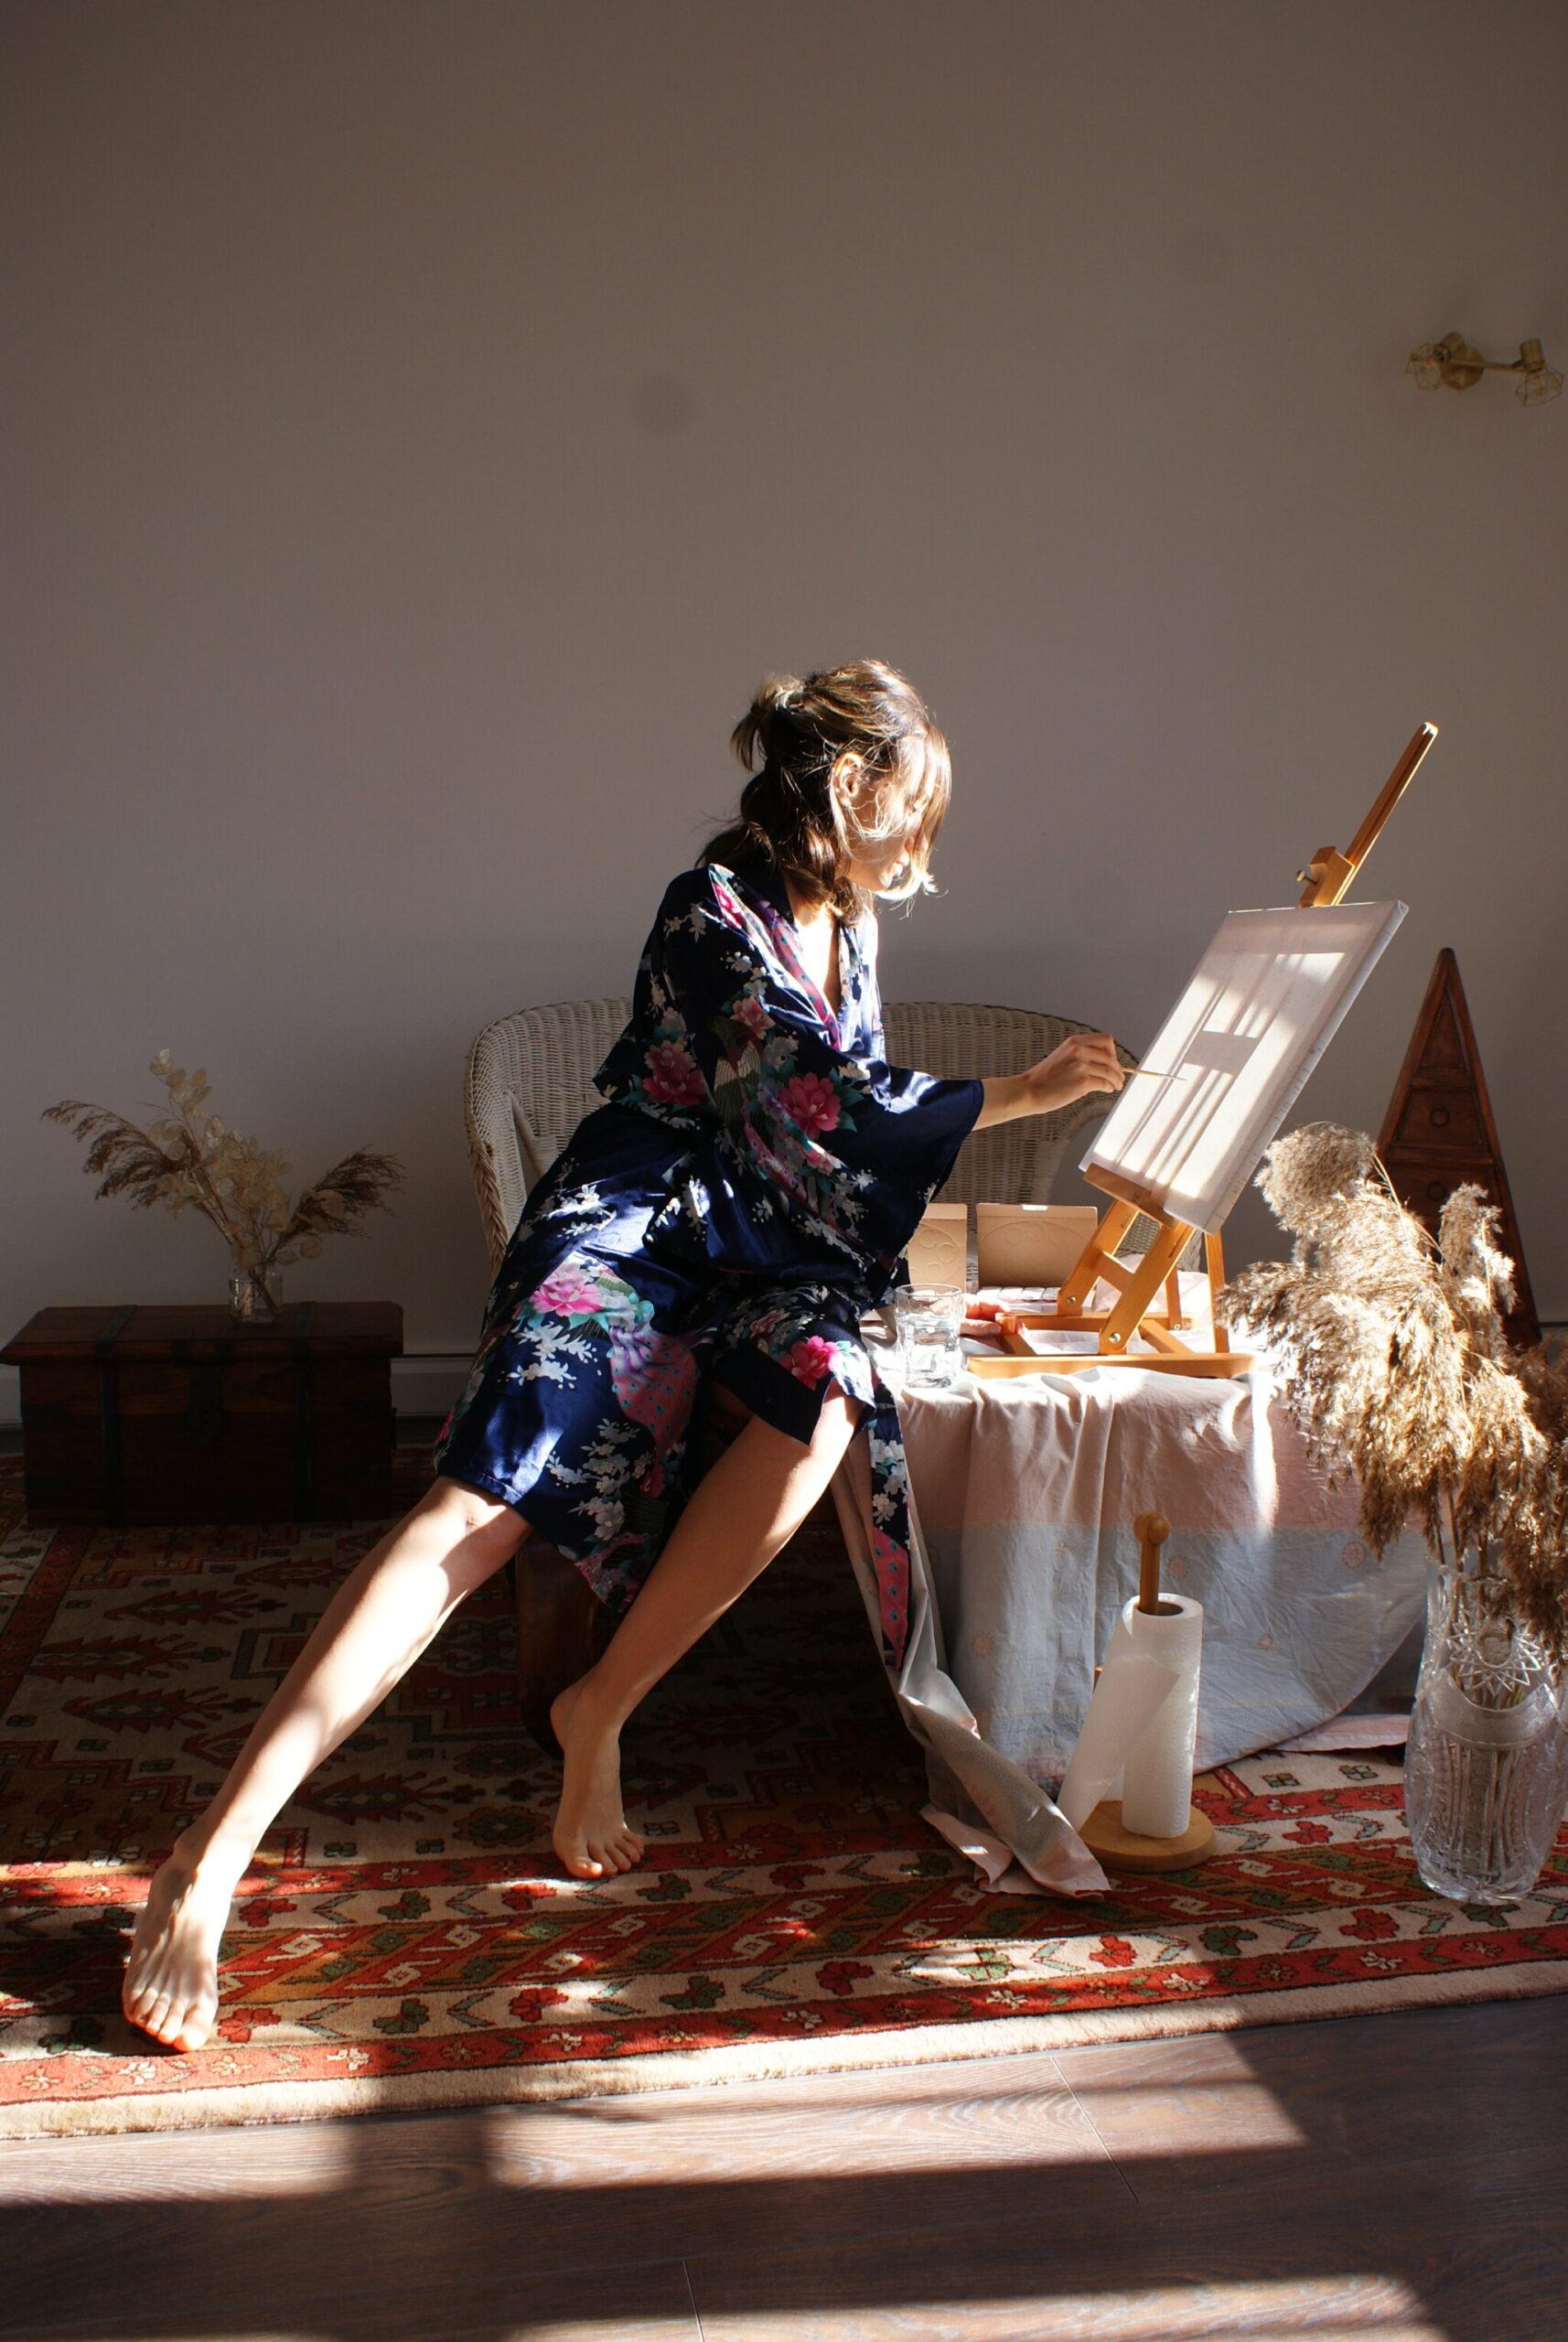 elisa diy lifestyle blogger italy italiana fai da te blogger creativa